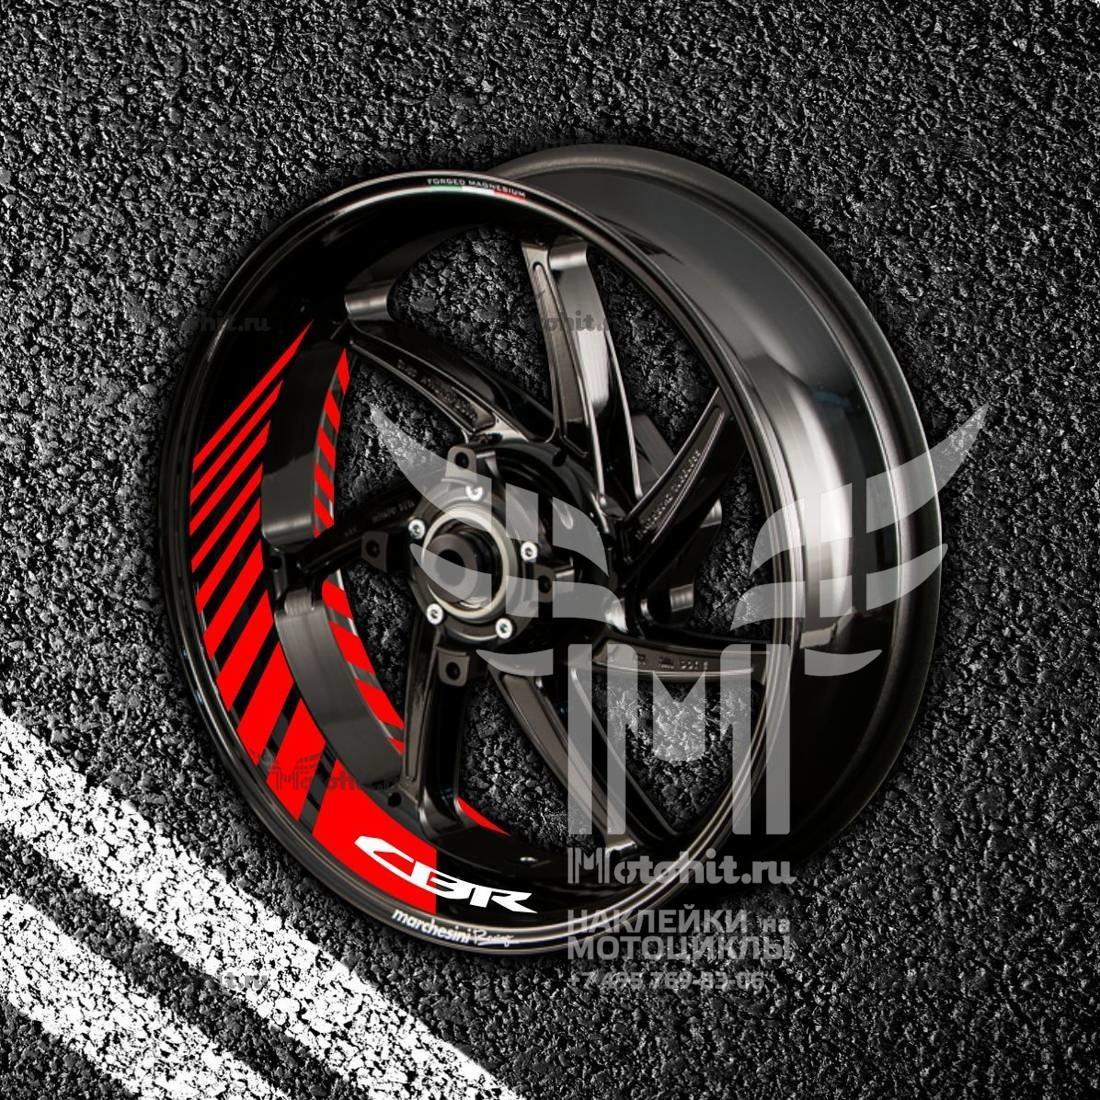 Комплект наклеек с полосами на колеса мотоцикла HONDA CBR-3